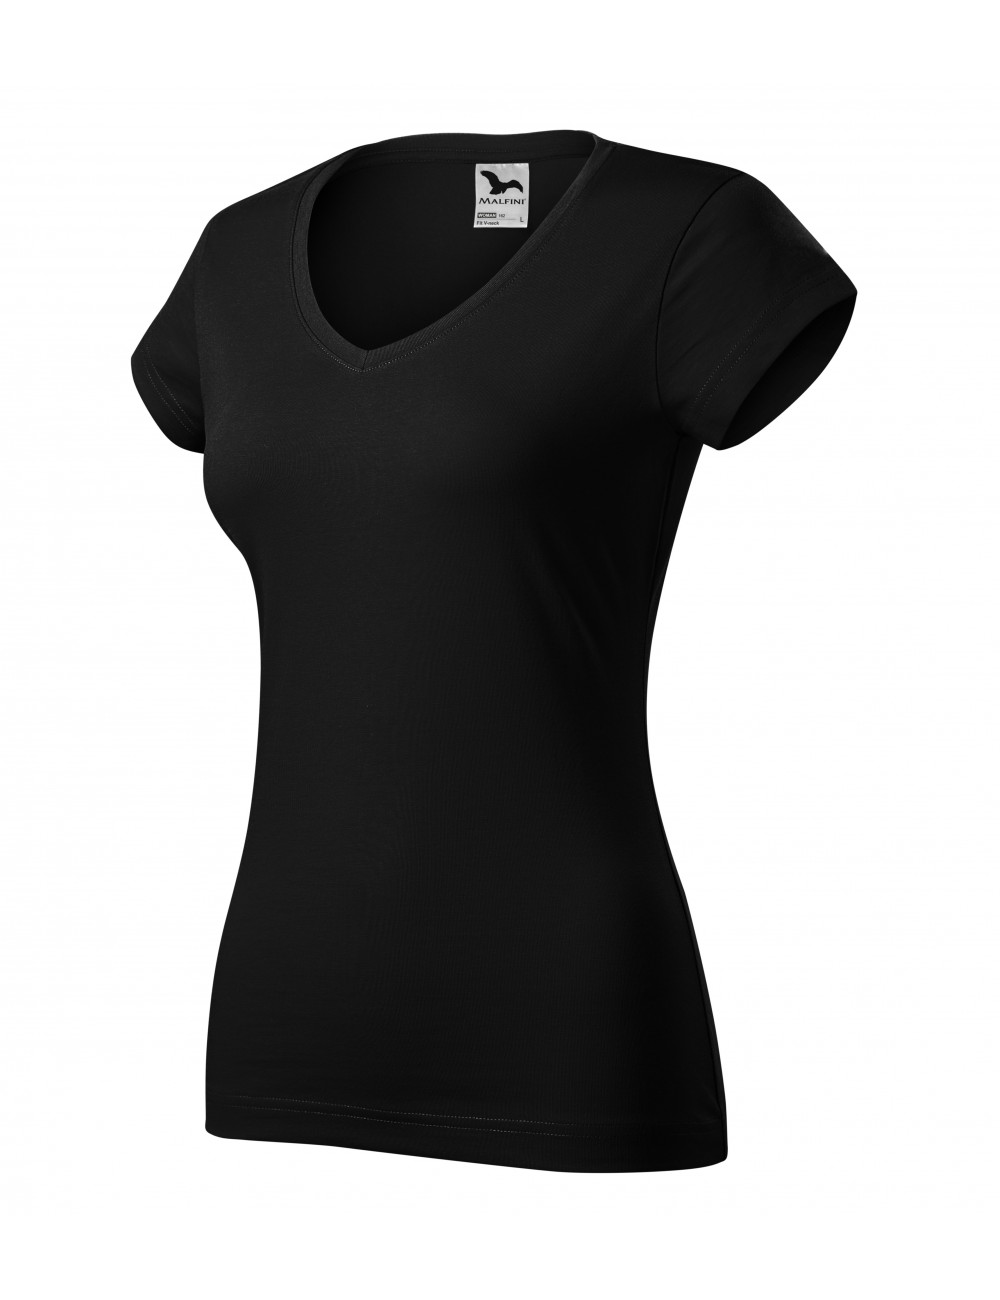 Adler MALFINI Koszulka damska Fit V-neck 162 czarny